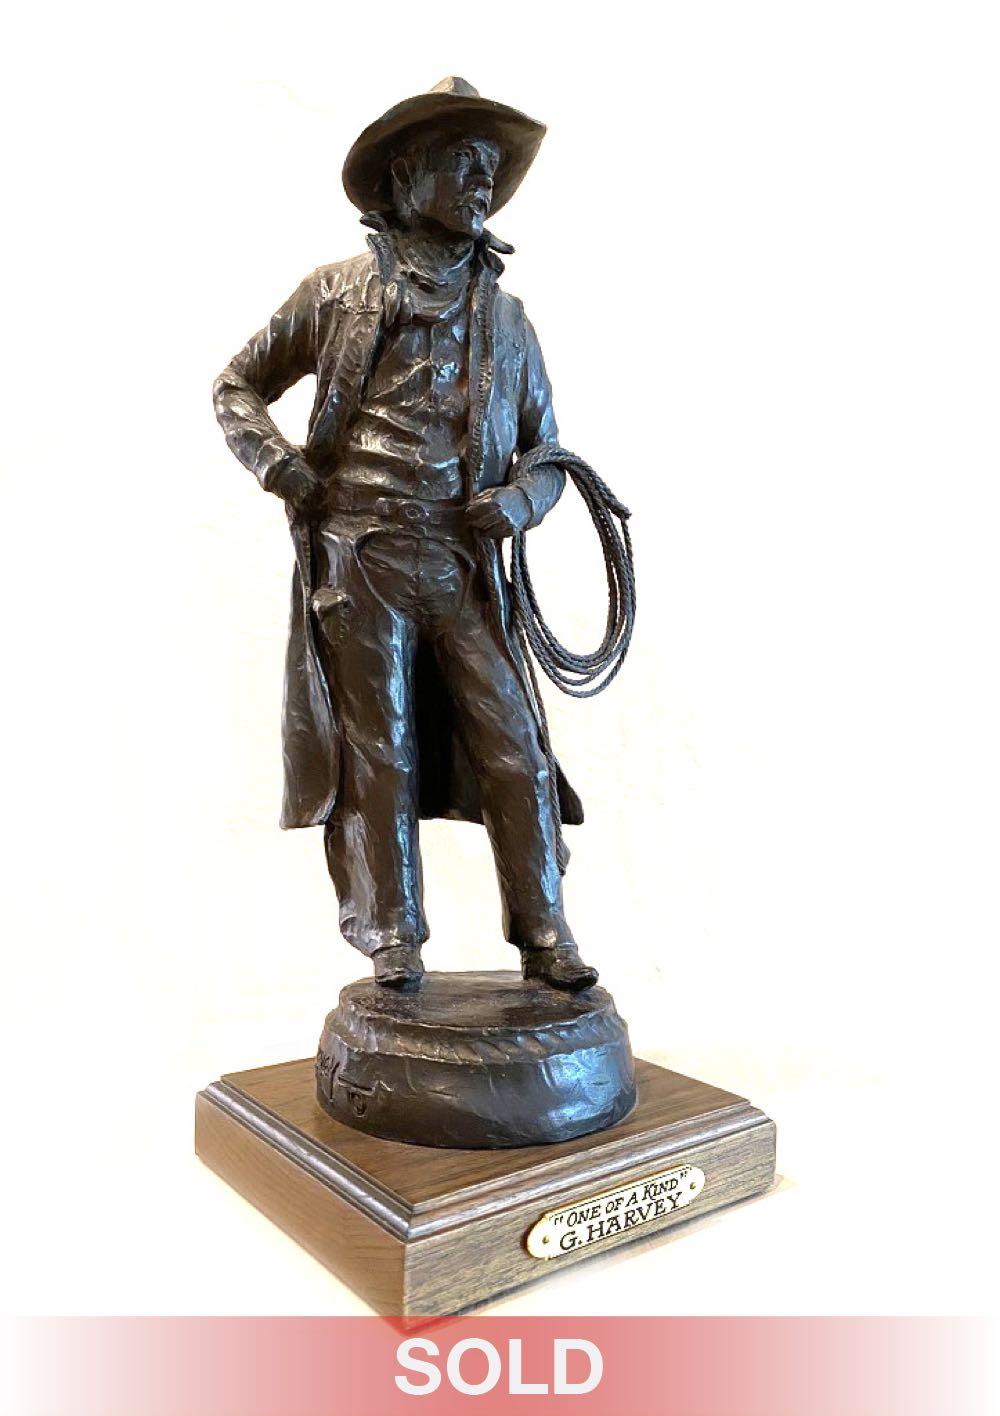 G. Harvey One of a Kind cowboy western bronze sculpture